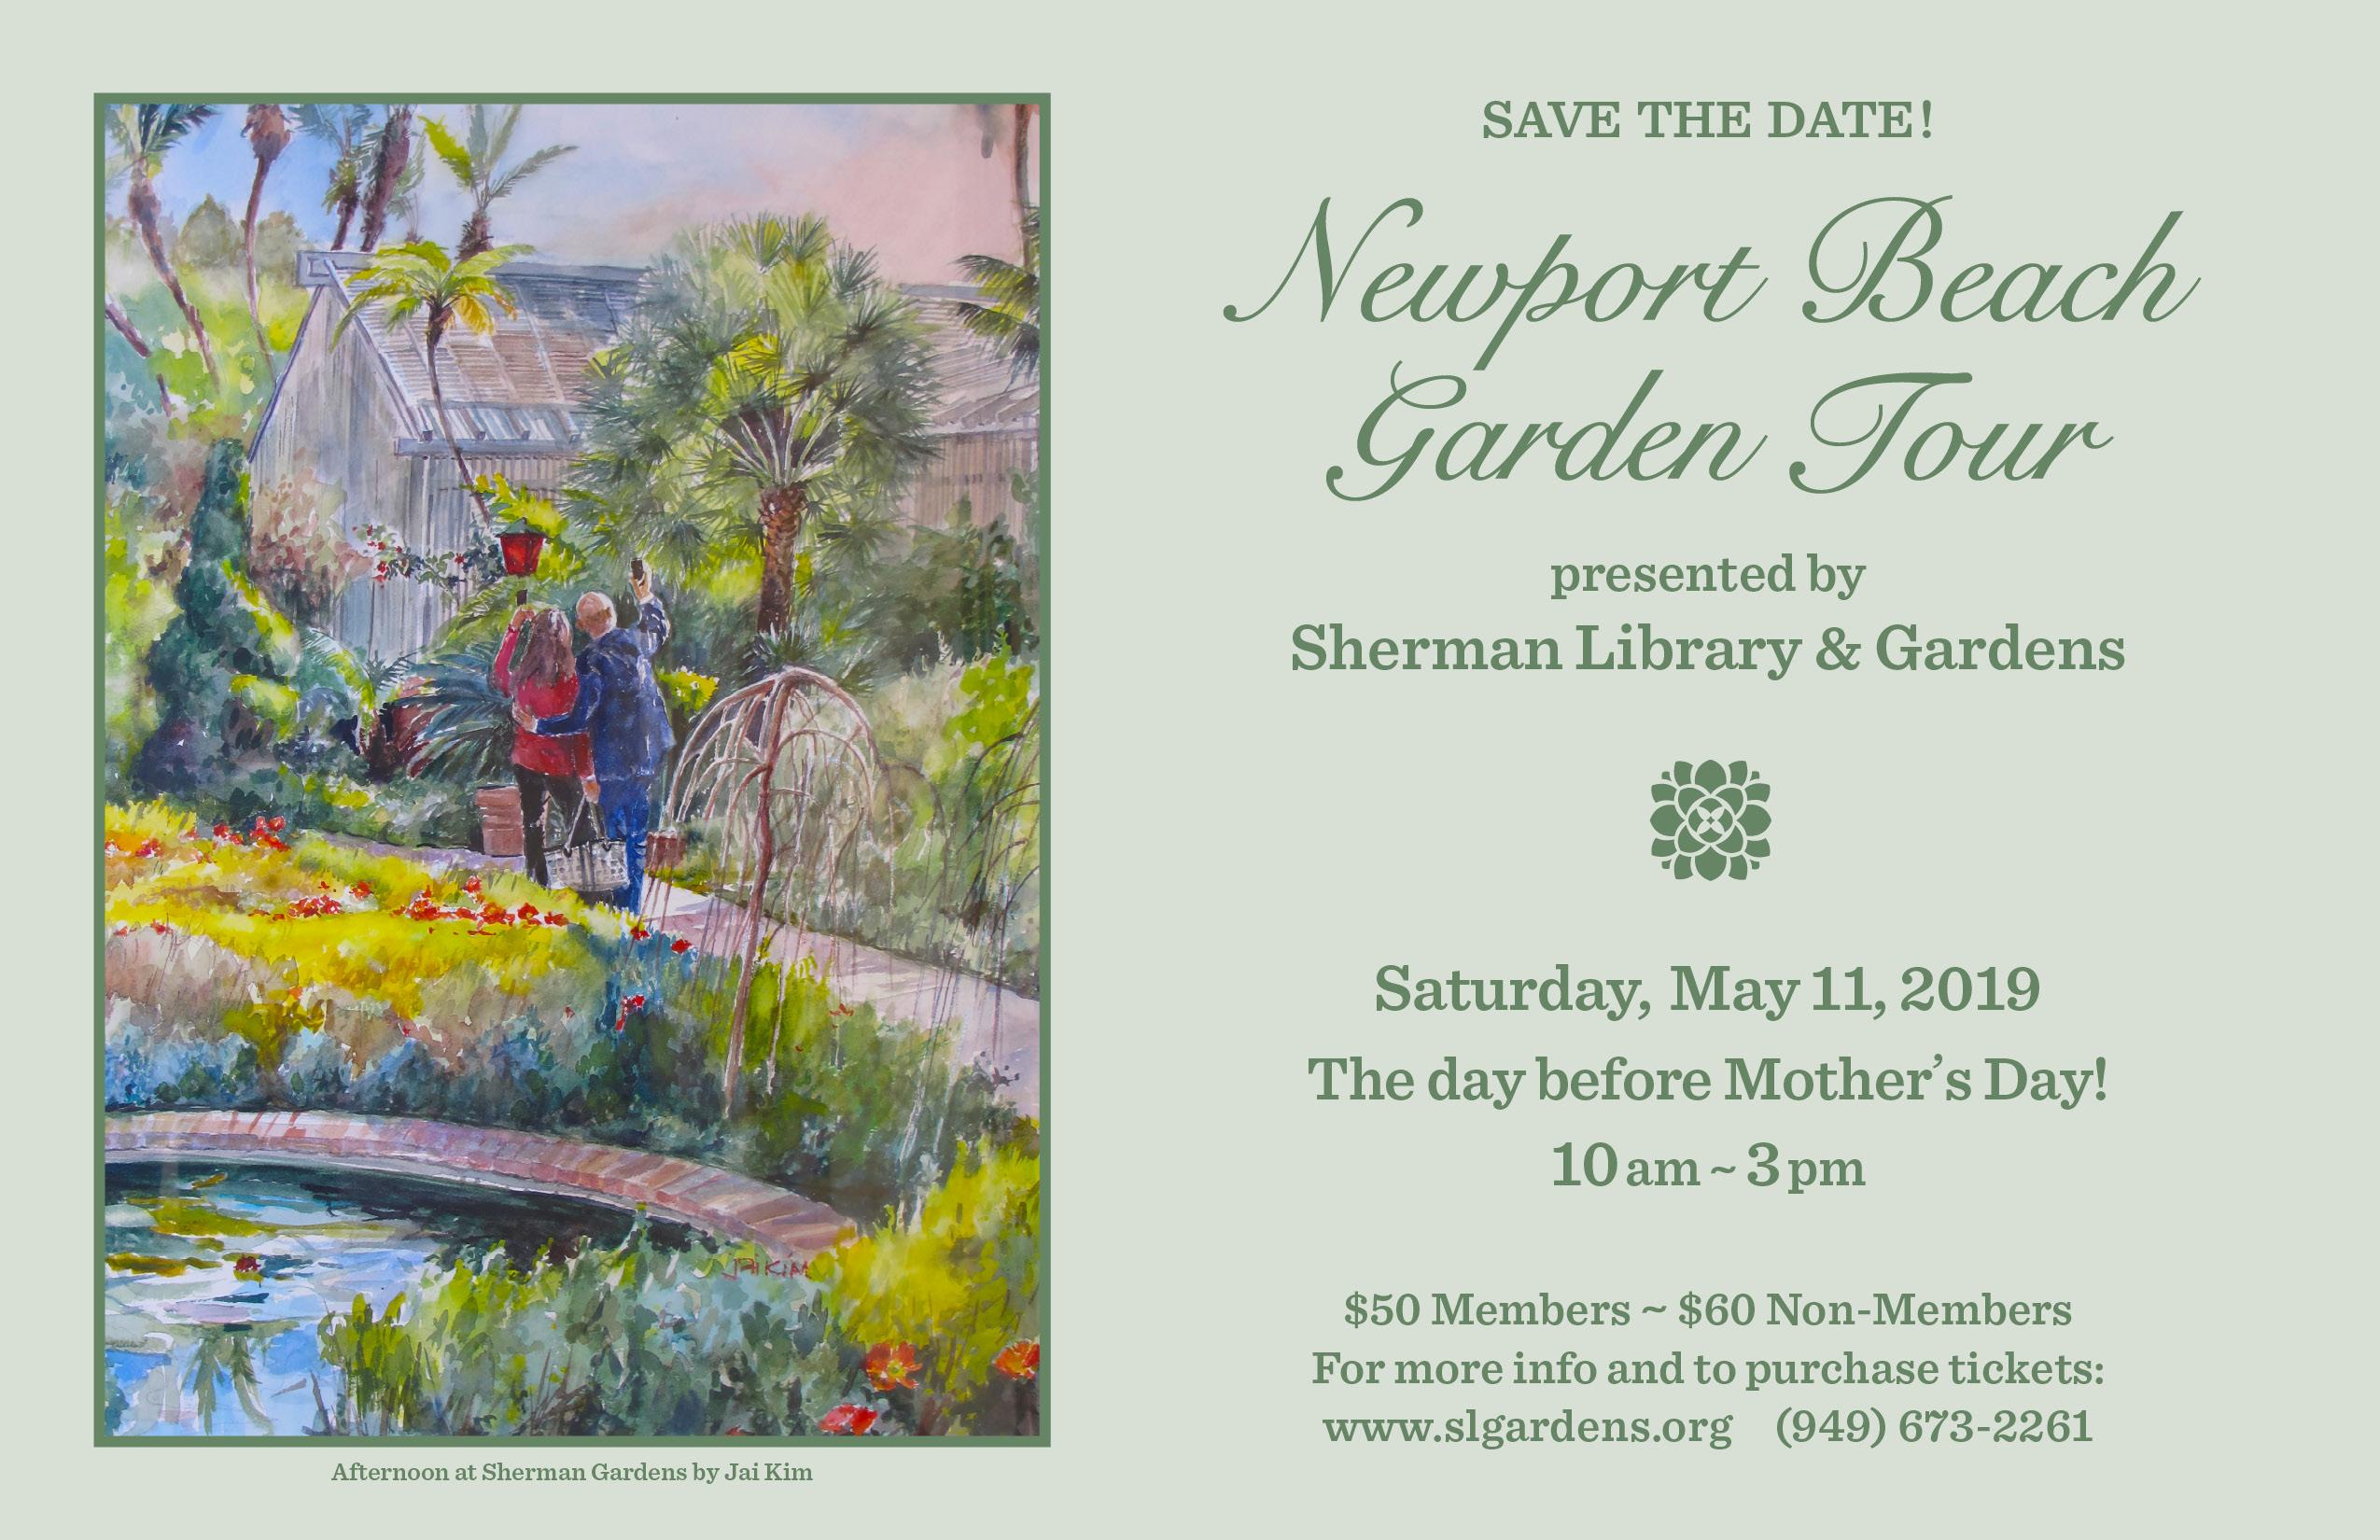 An image of the Newport Beach Garden Tour invitation